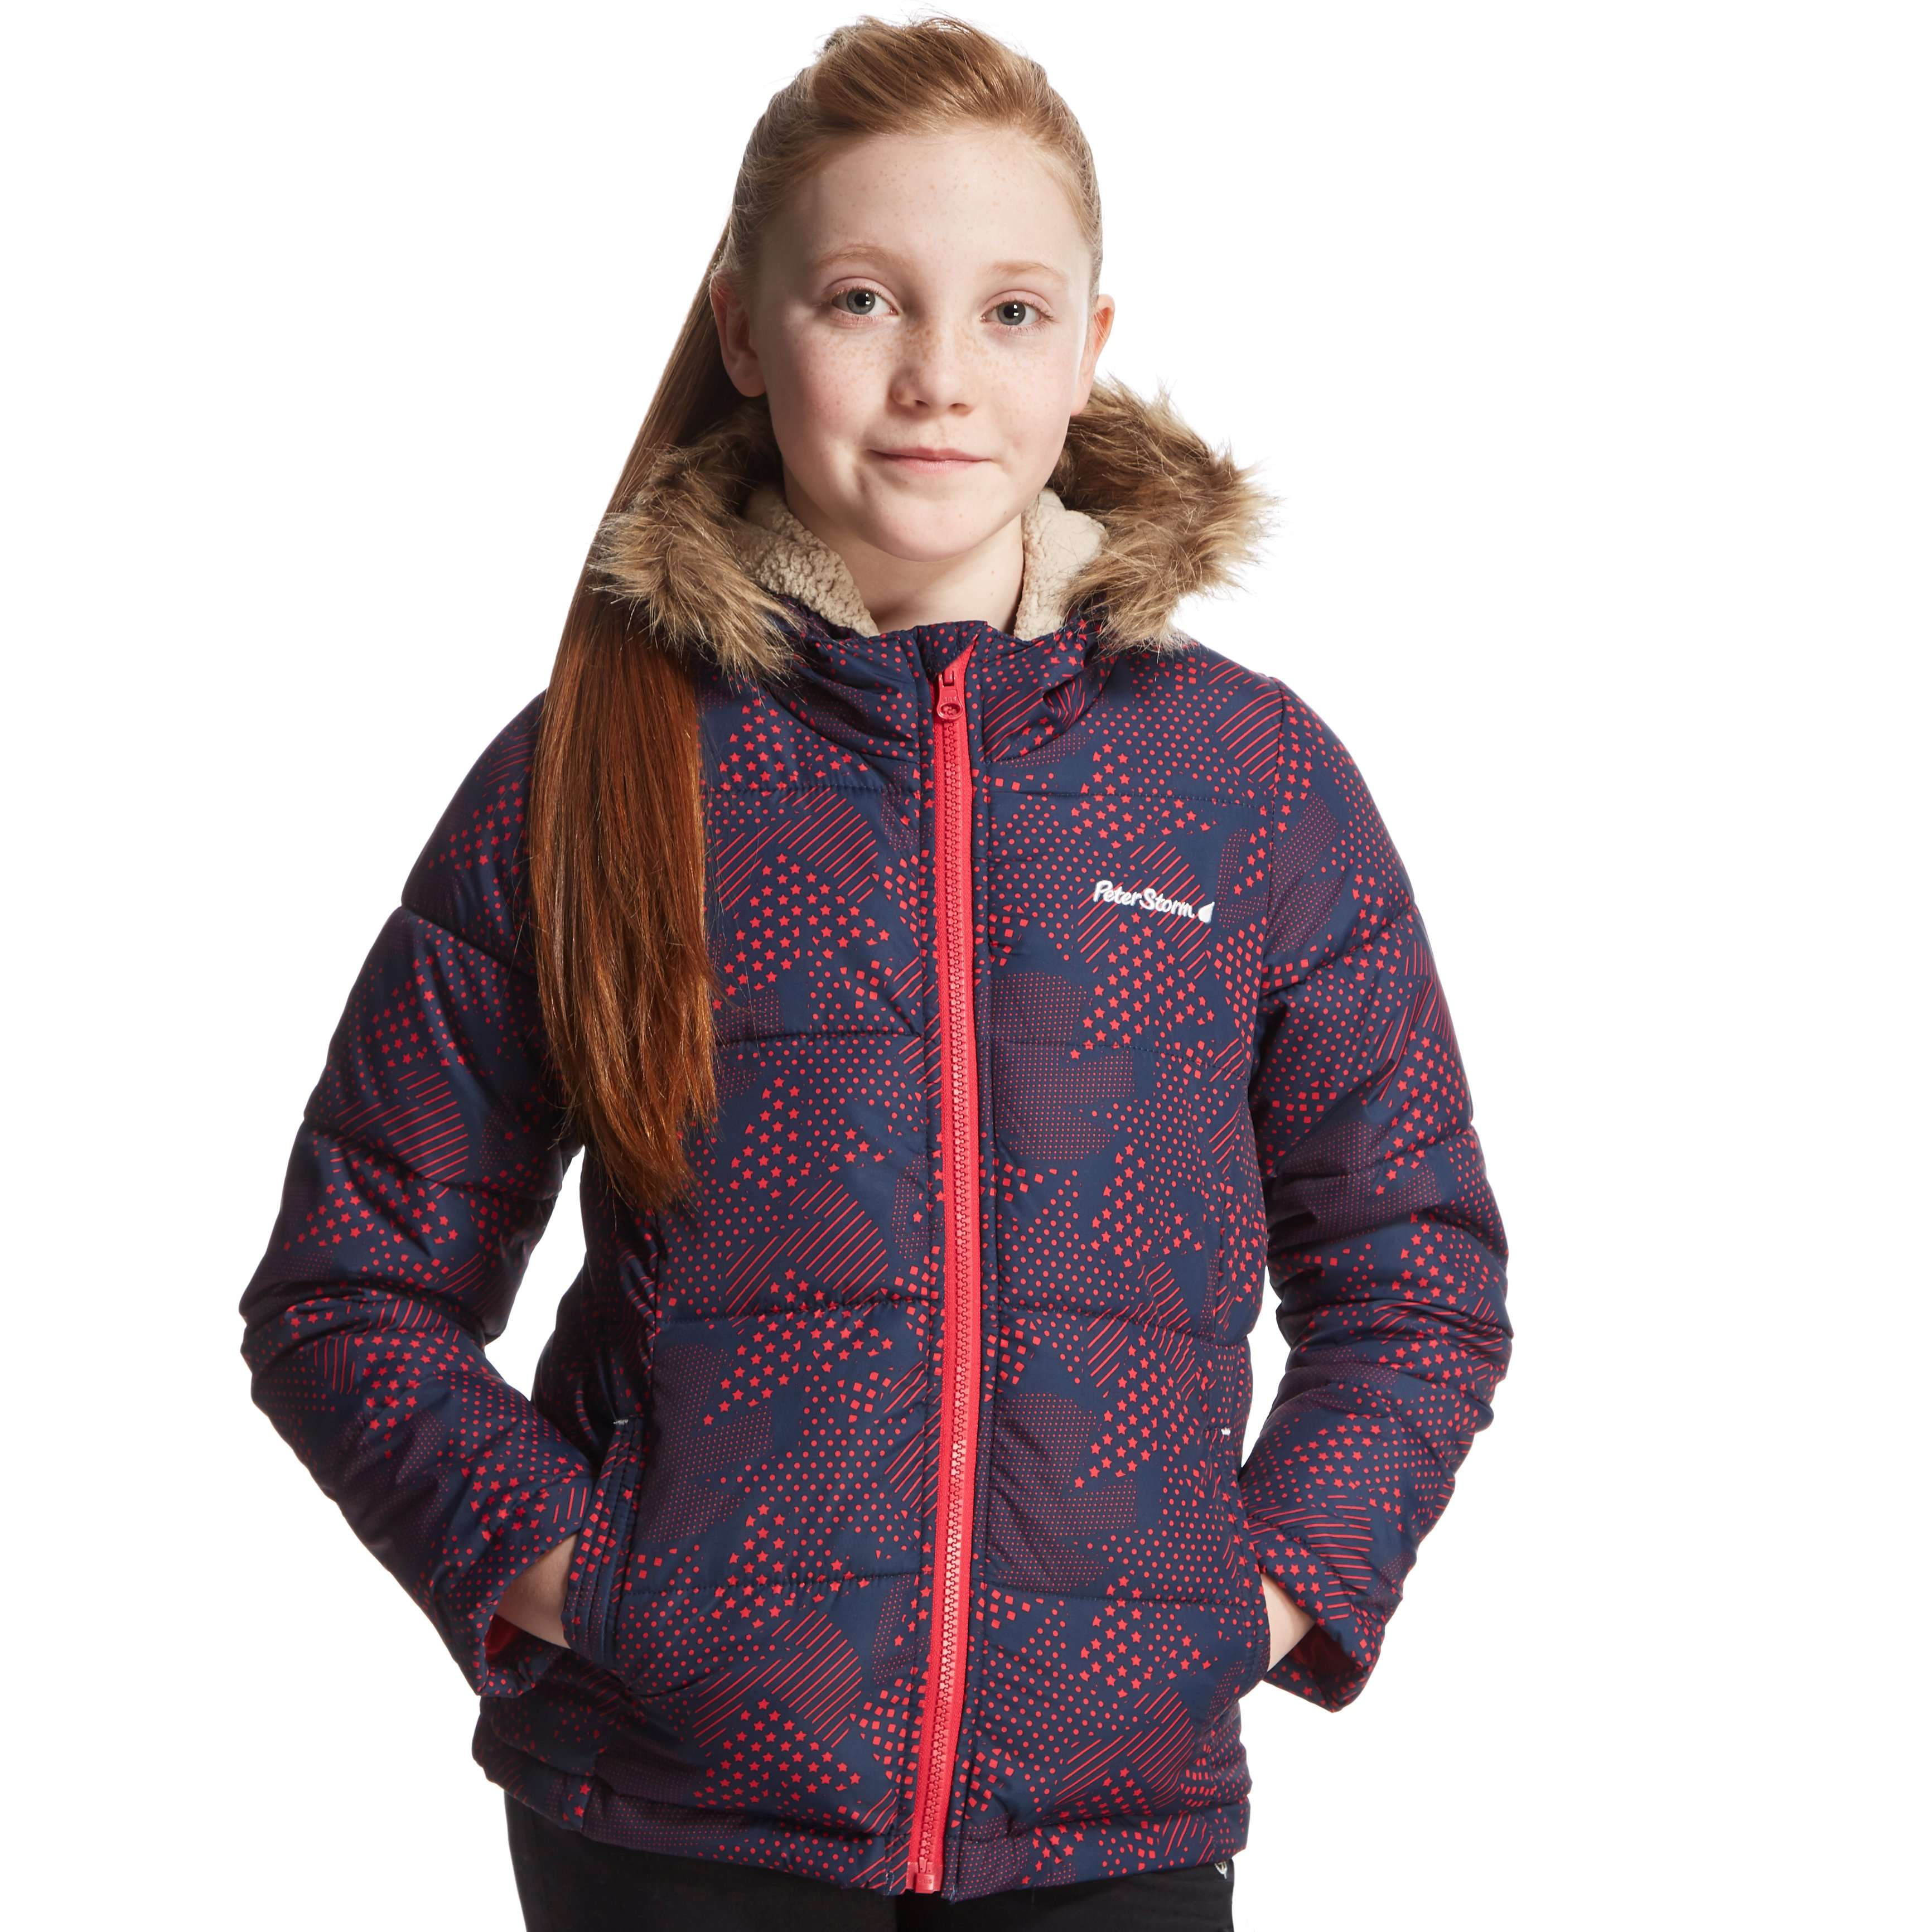 PETER STORM Girls' Esme Jacket